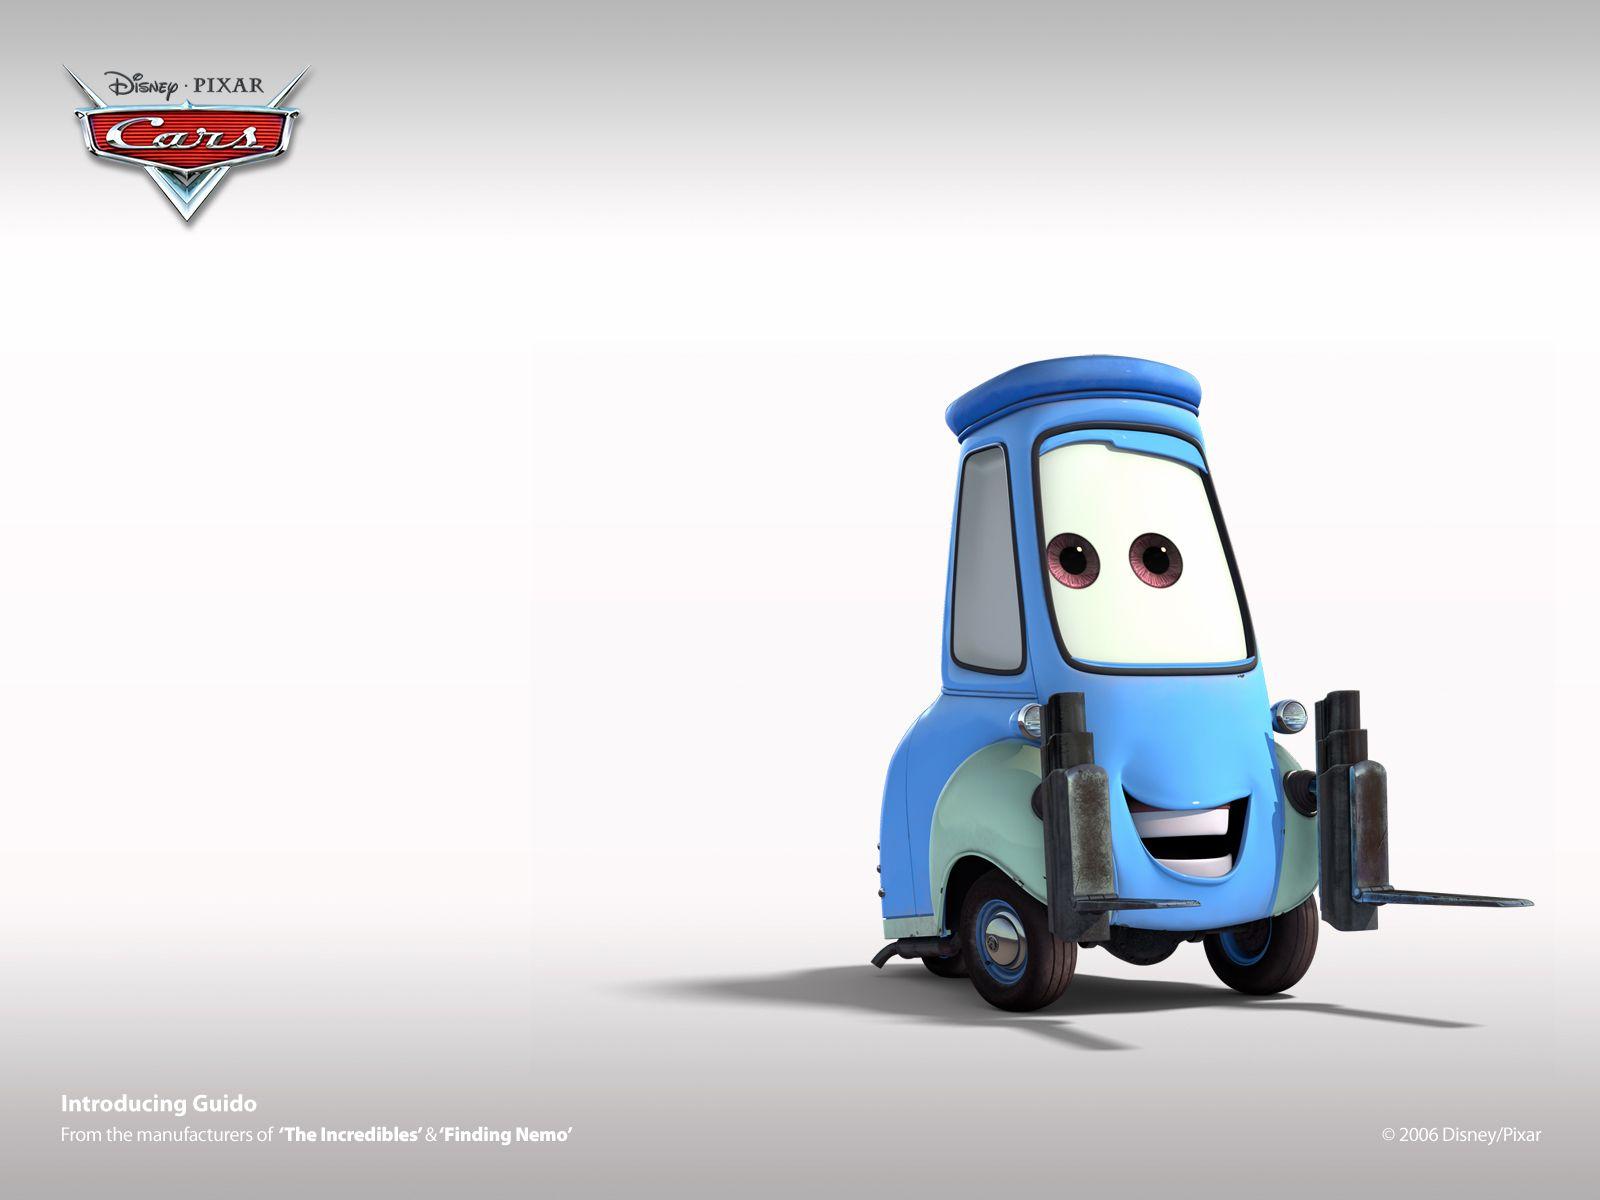 disney cars images free Disney Cars Disney, Pixar, Ipad